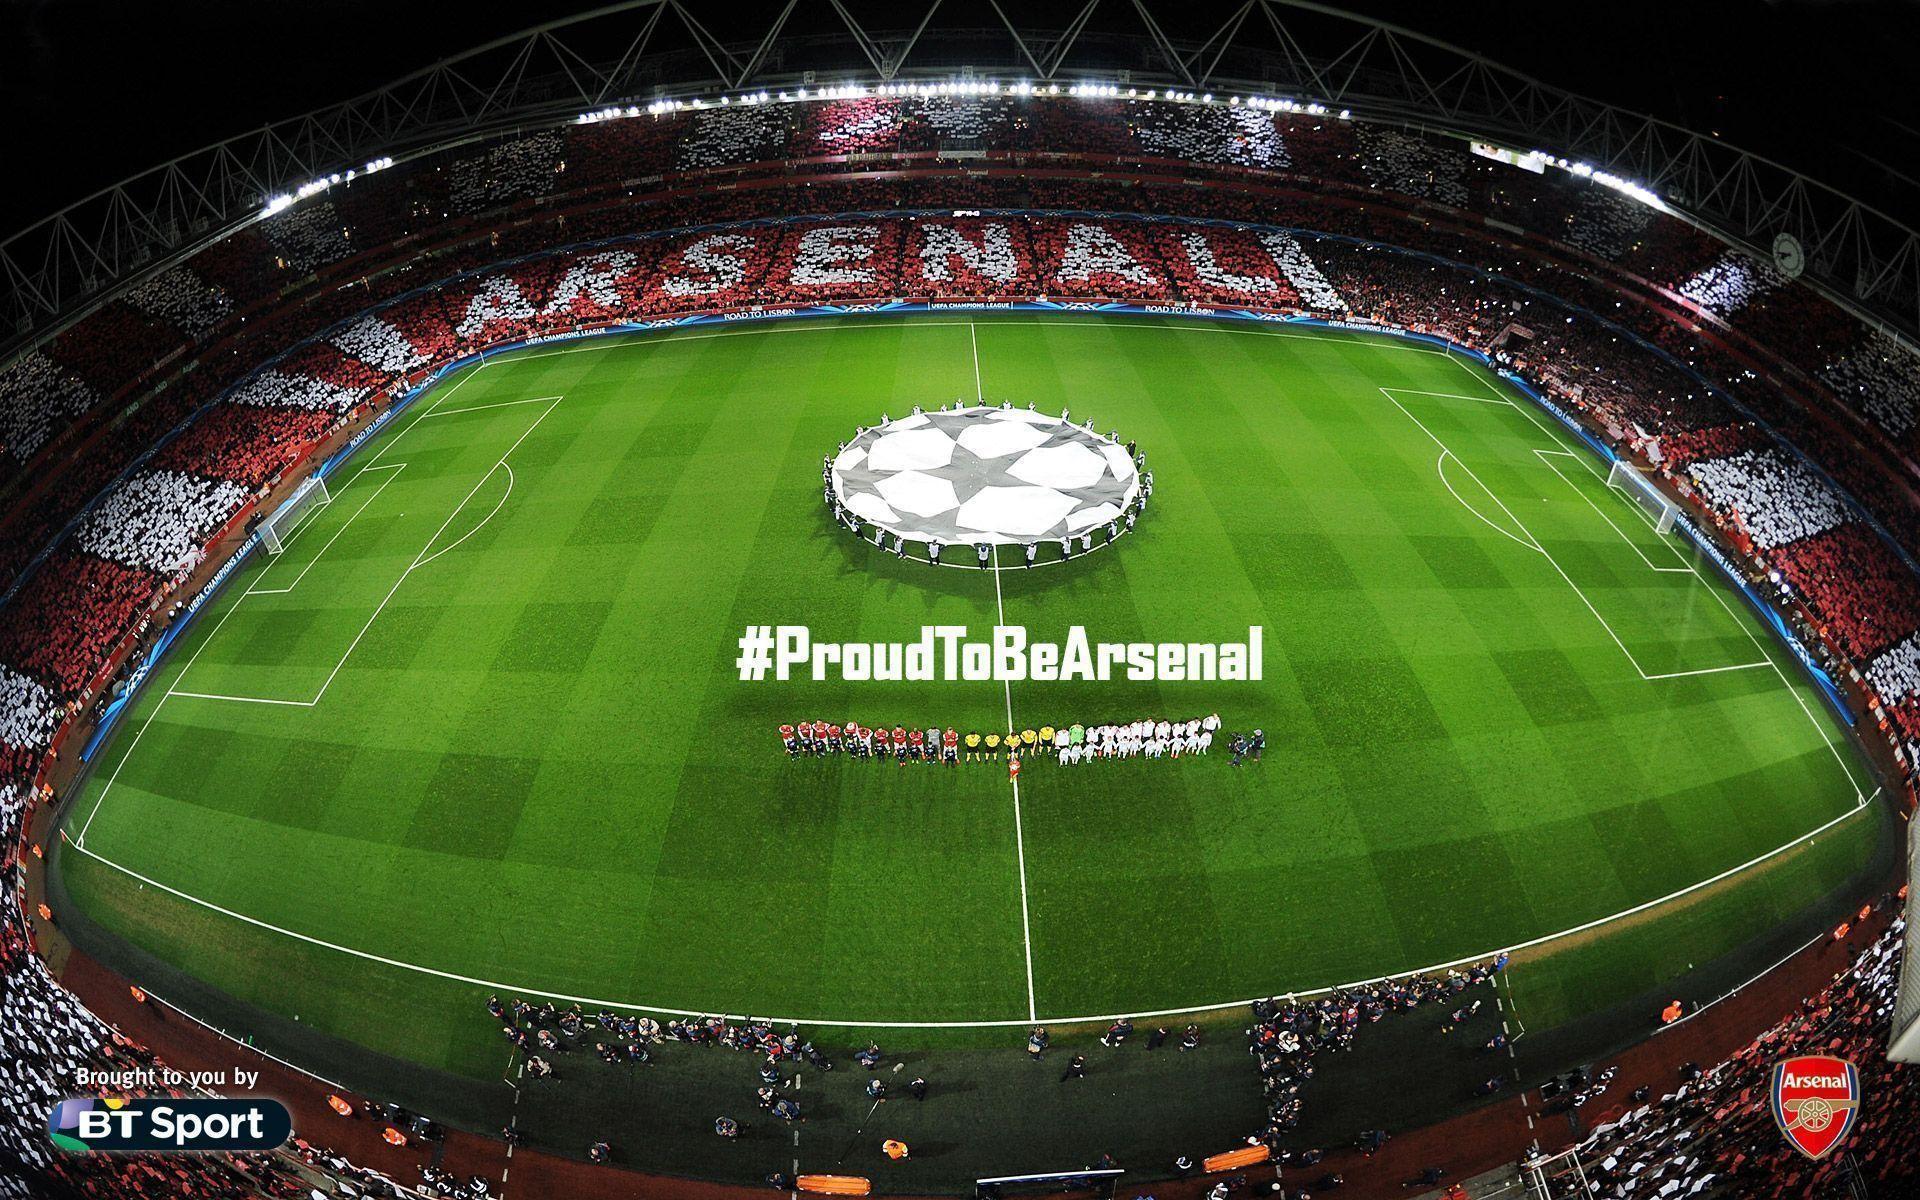 Best Emirates Stadium Wallpapers Wallpapers 2020 Stadium Wallpaper Arsenal Wallpapers Arsenal 640 x 480